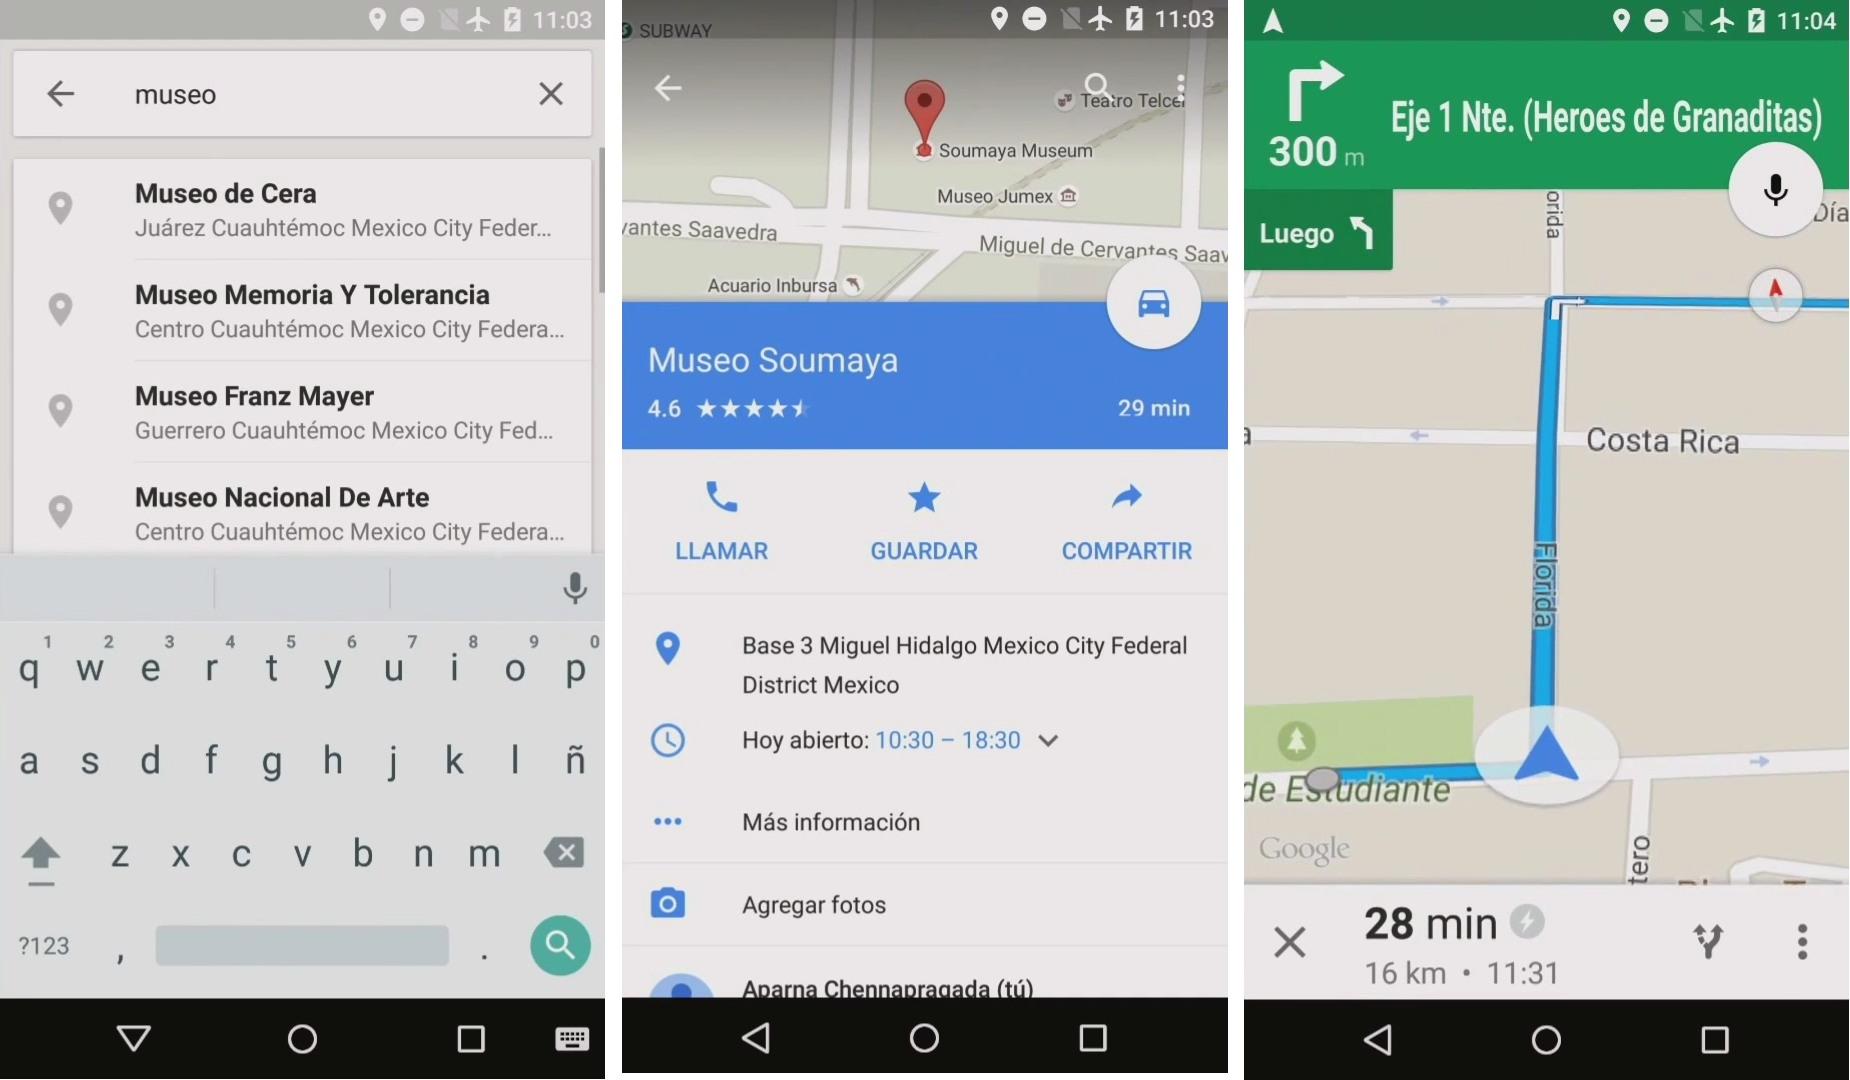 Mar Mobilnet Nelkul Is Mukodik A Navigacio A Google Maps Ben Pc